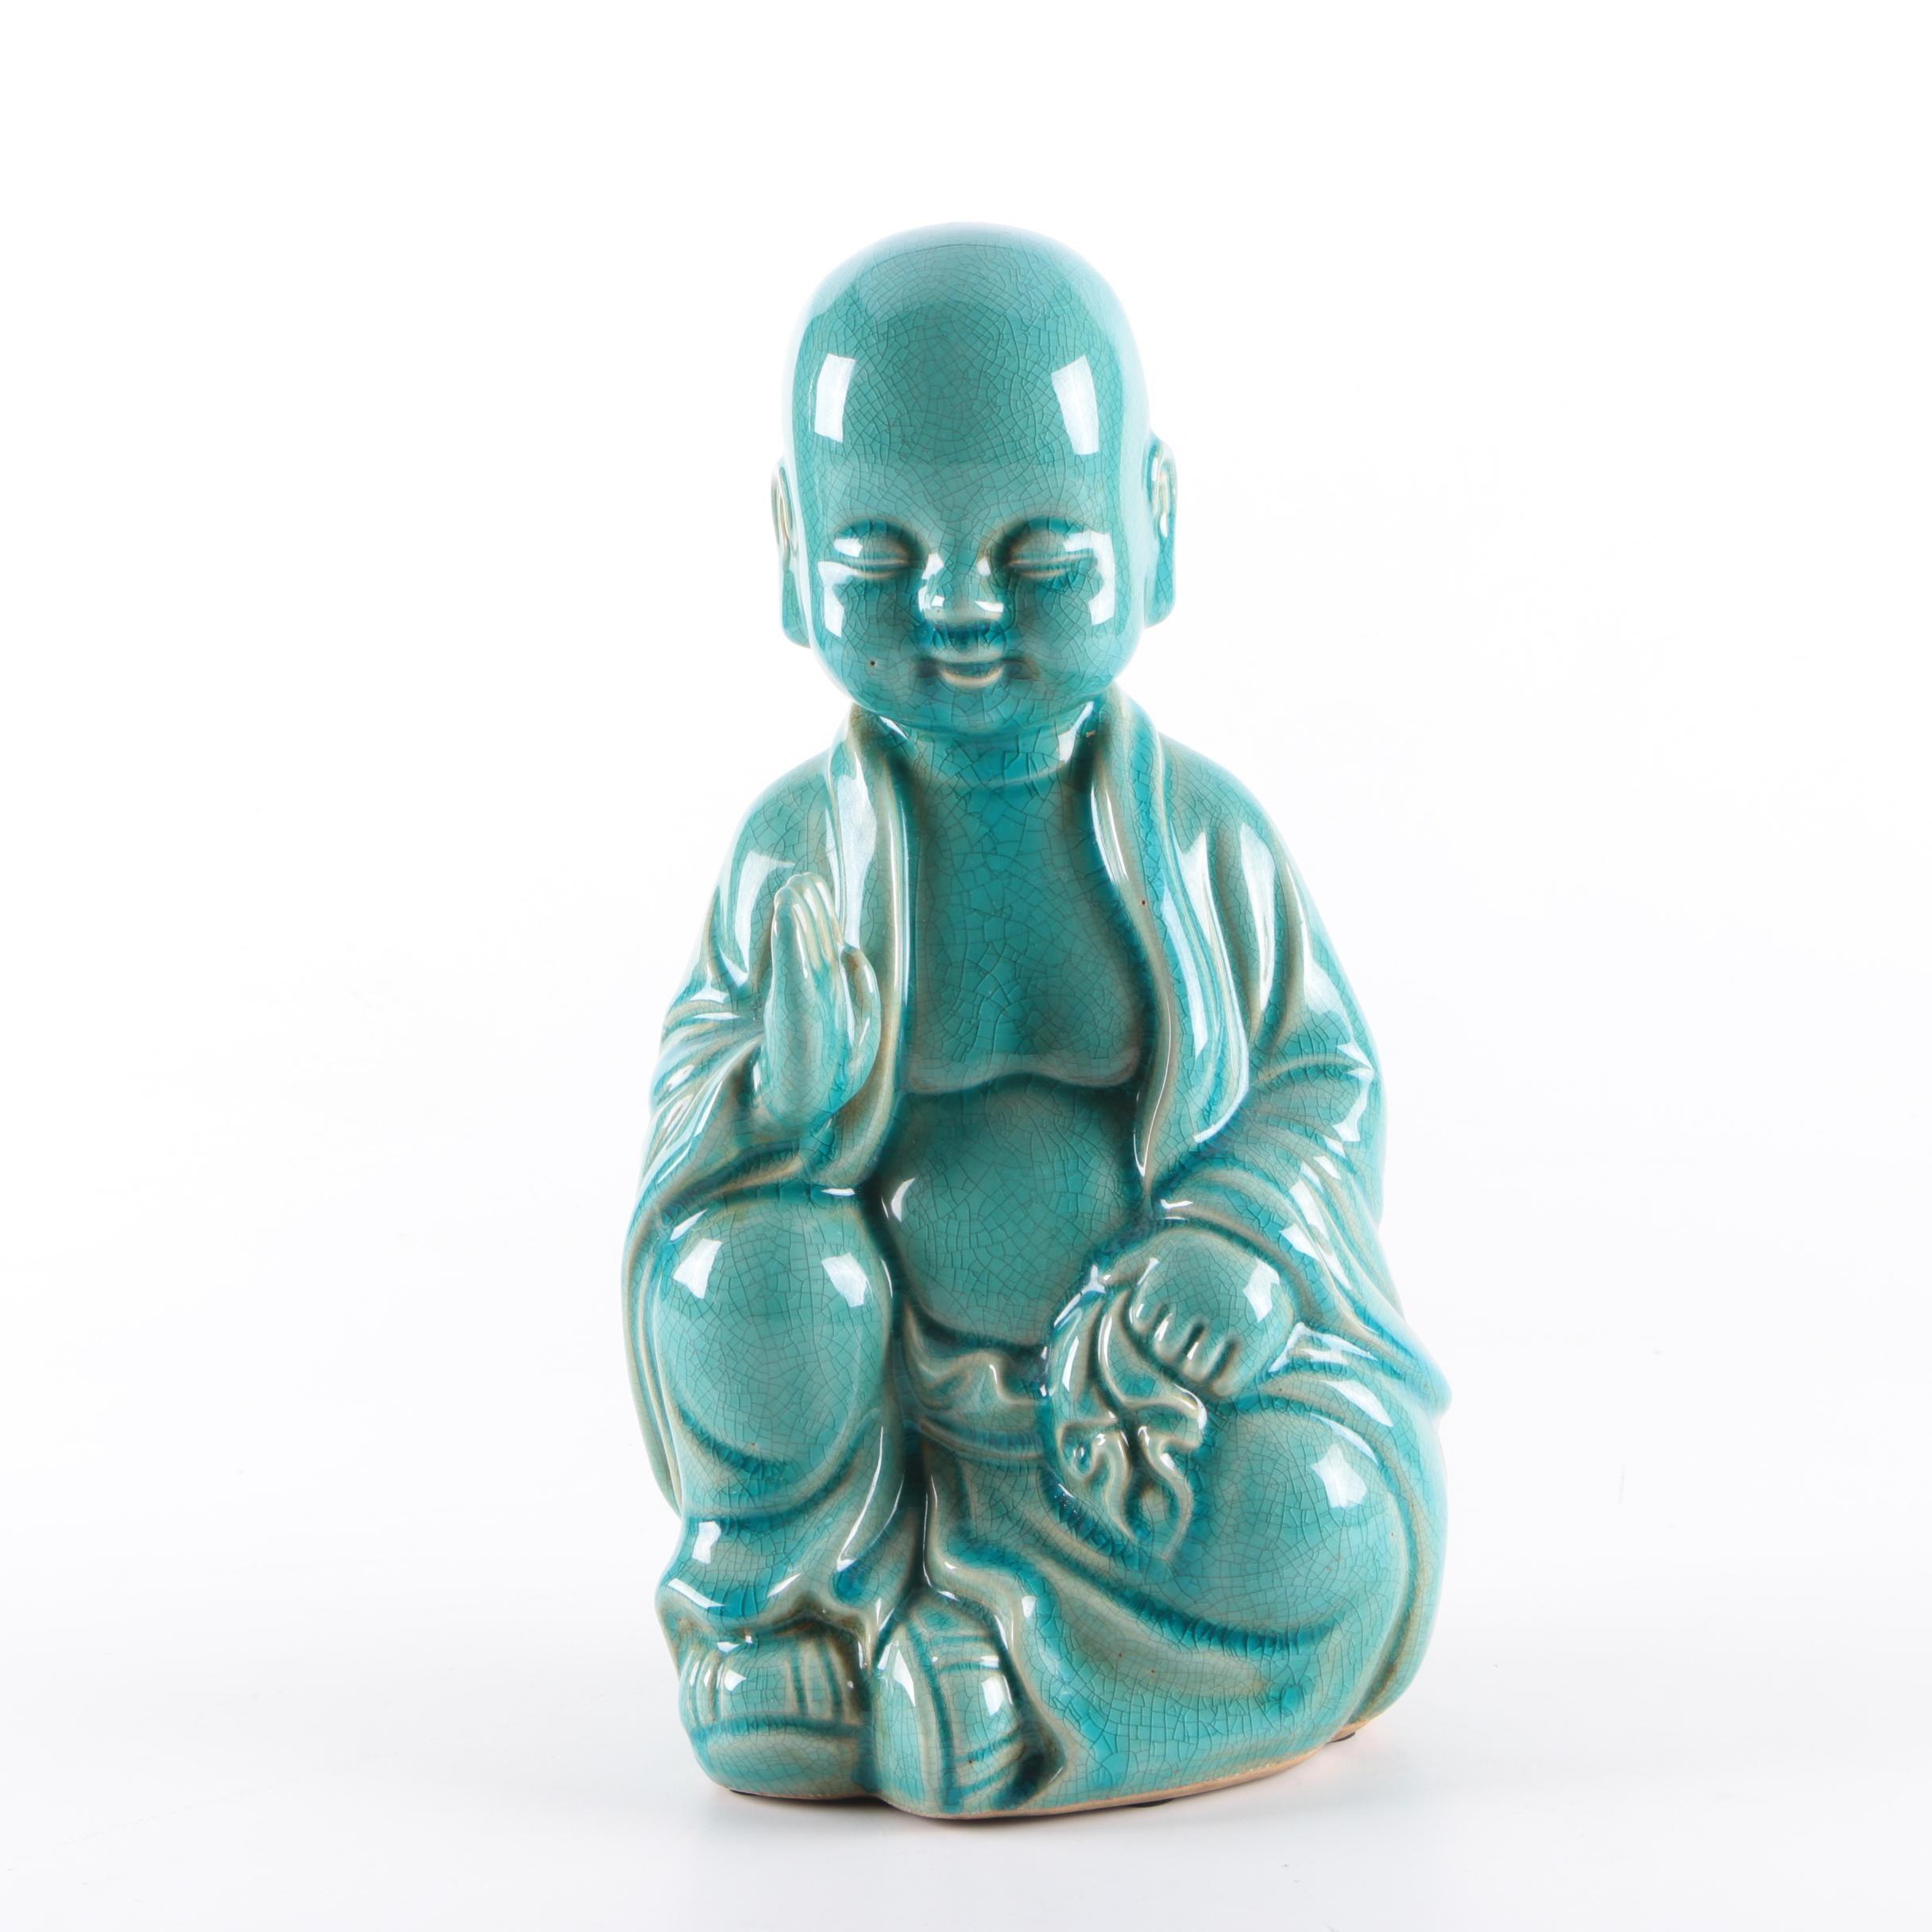 Green Ceramic Young Buddha Figurine